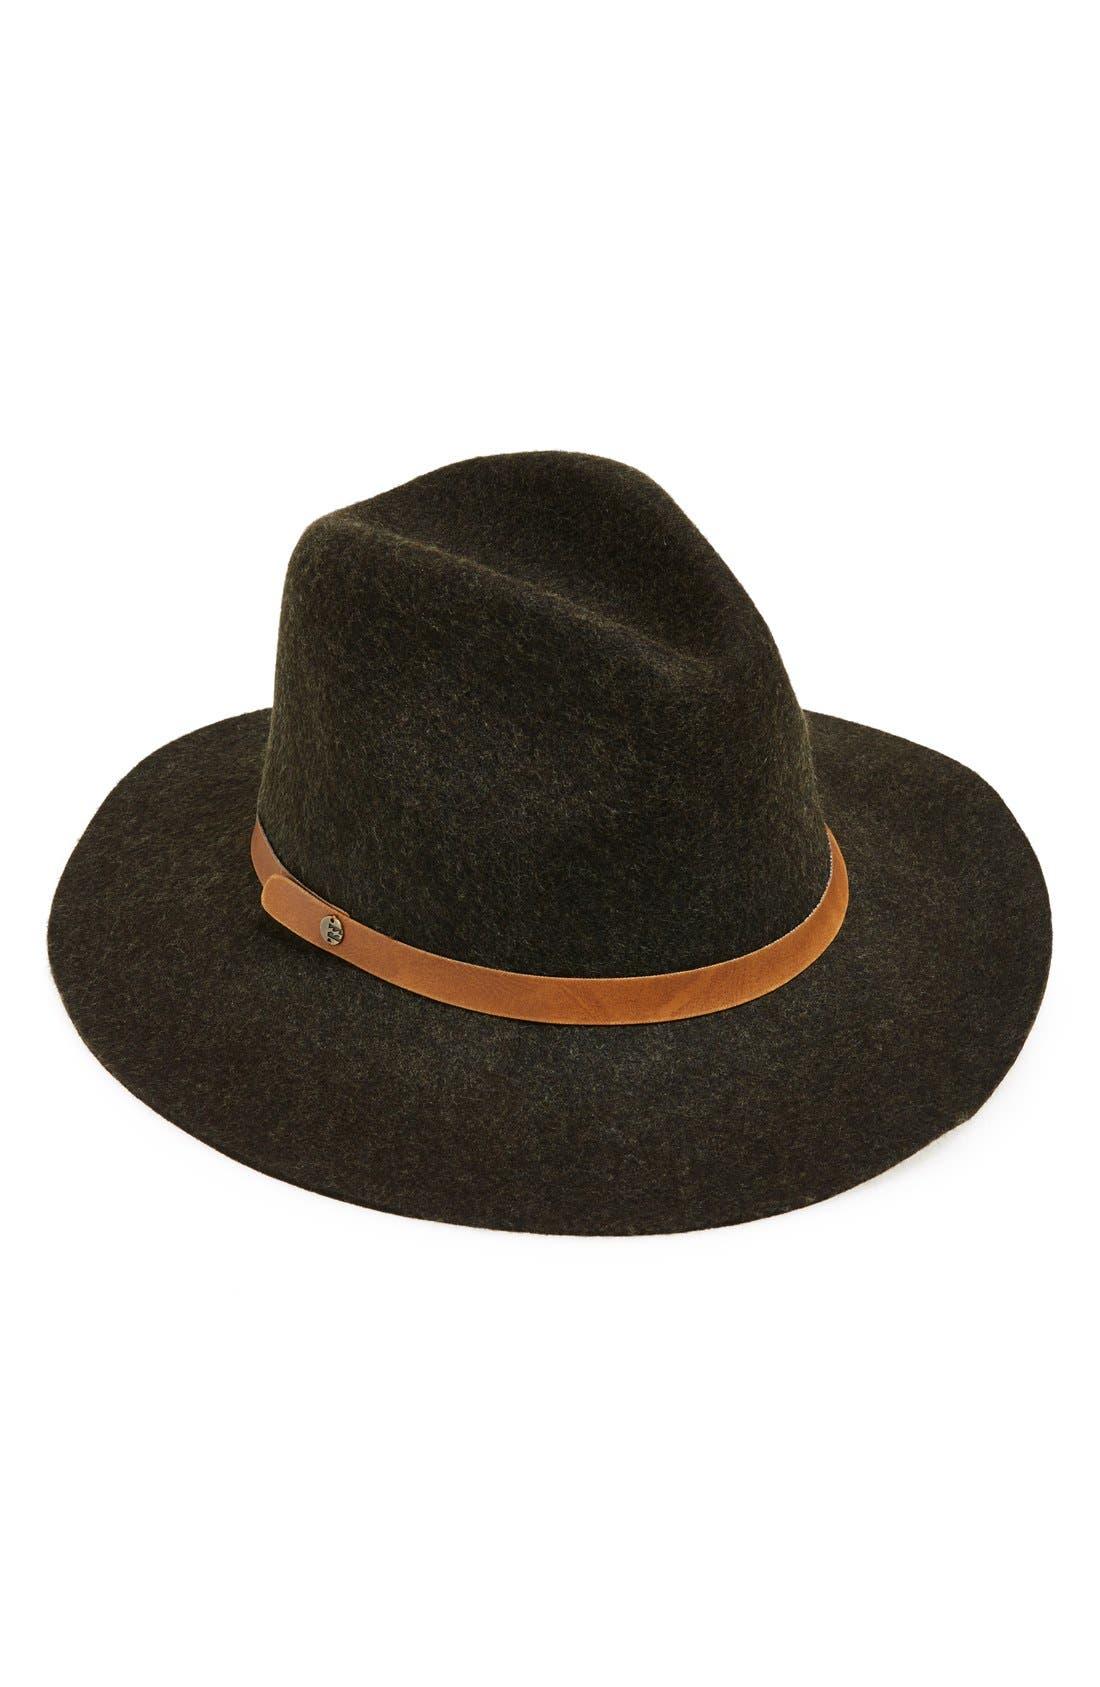 Main Image - Billabong 'Better Over Here' Panama Hat